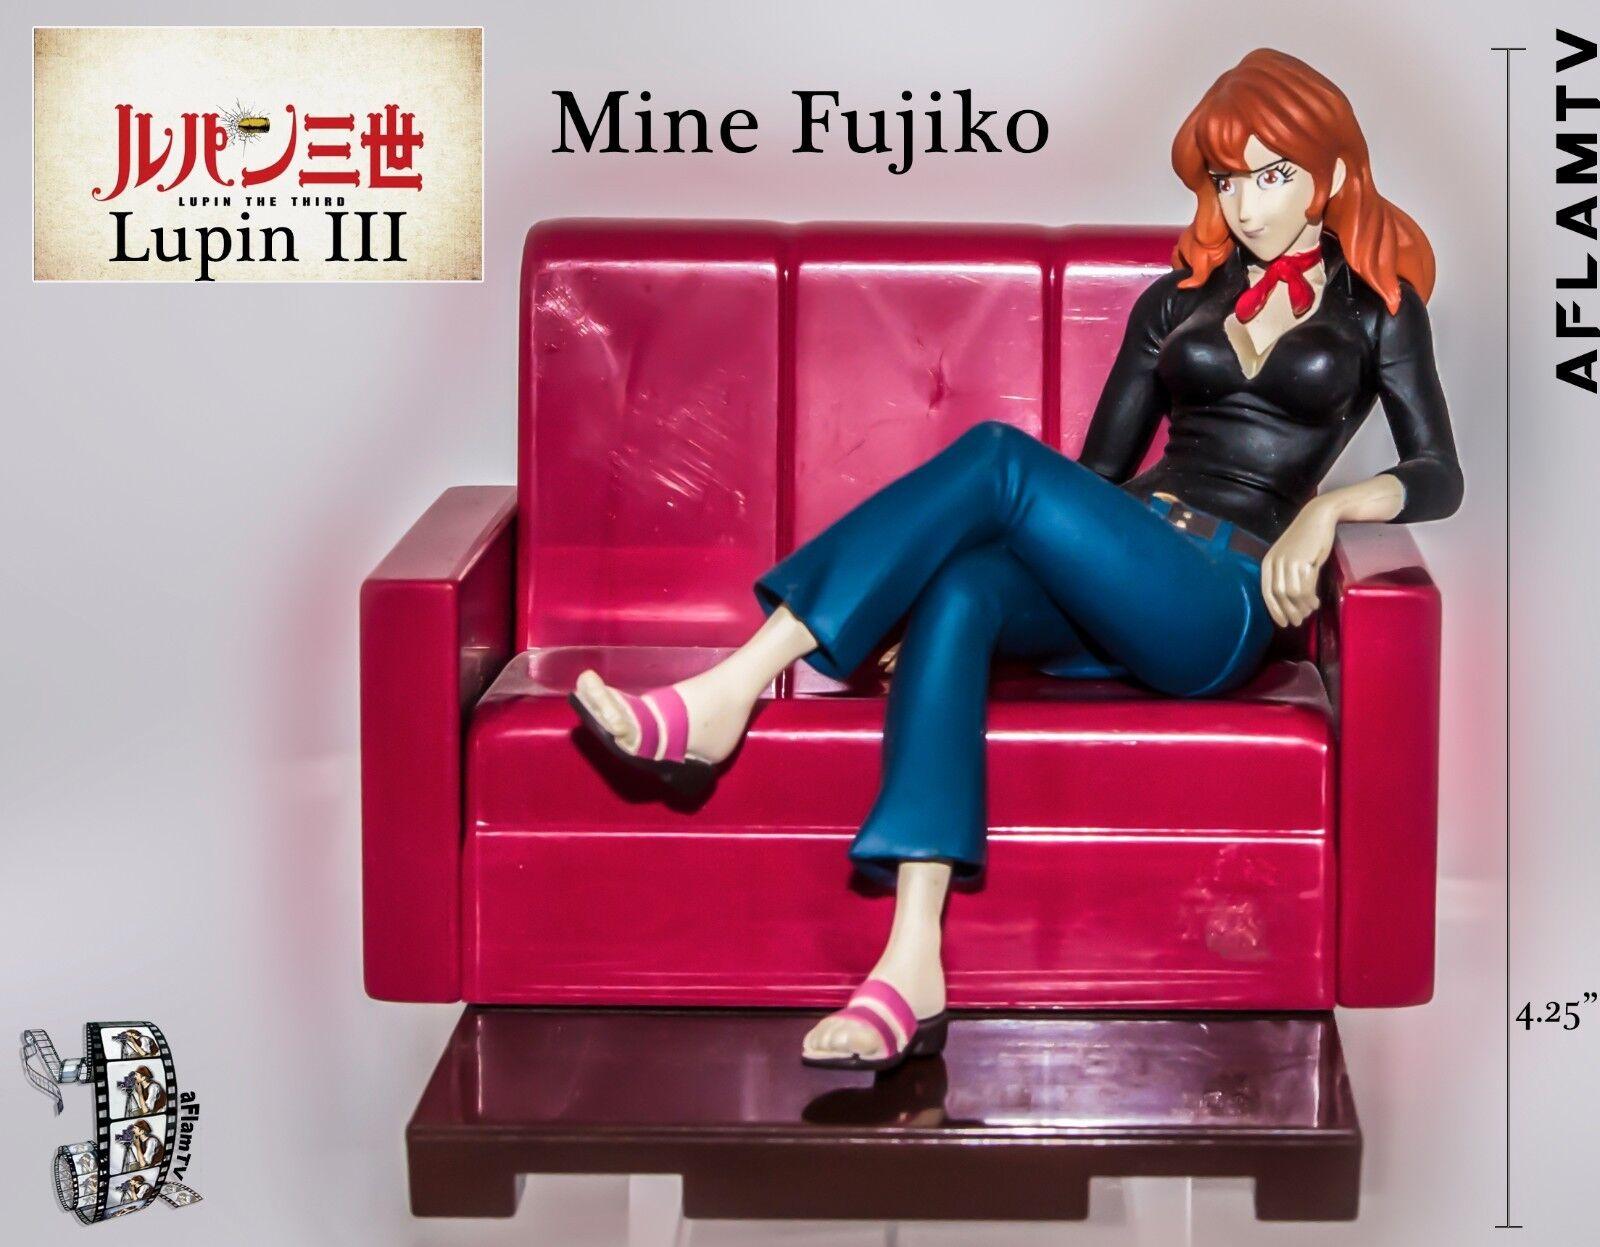 Lupin III The 36rd Third Family Figure set MINE FUJIKO Anime Banpresto sofa 2003